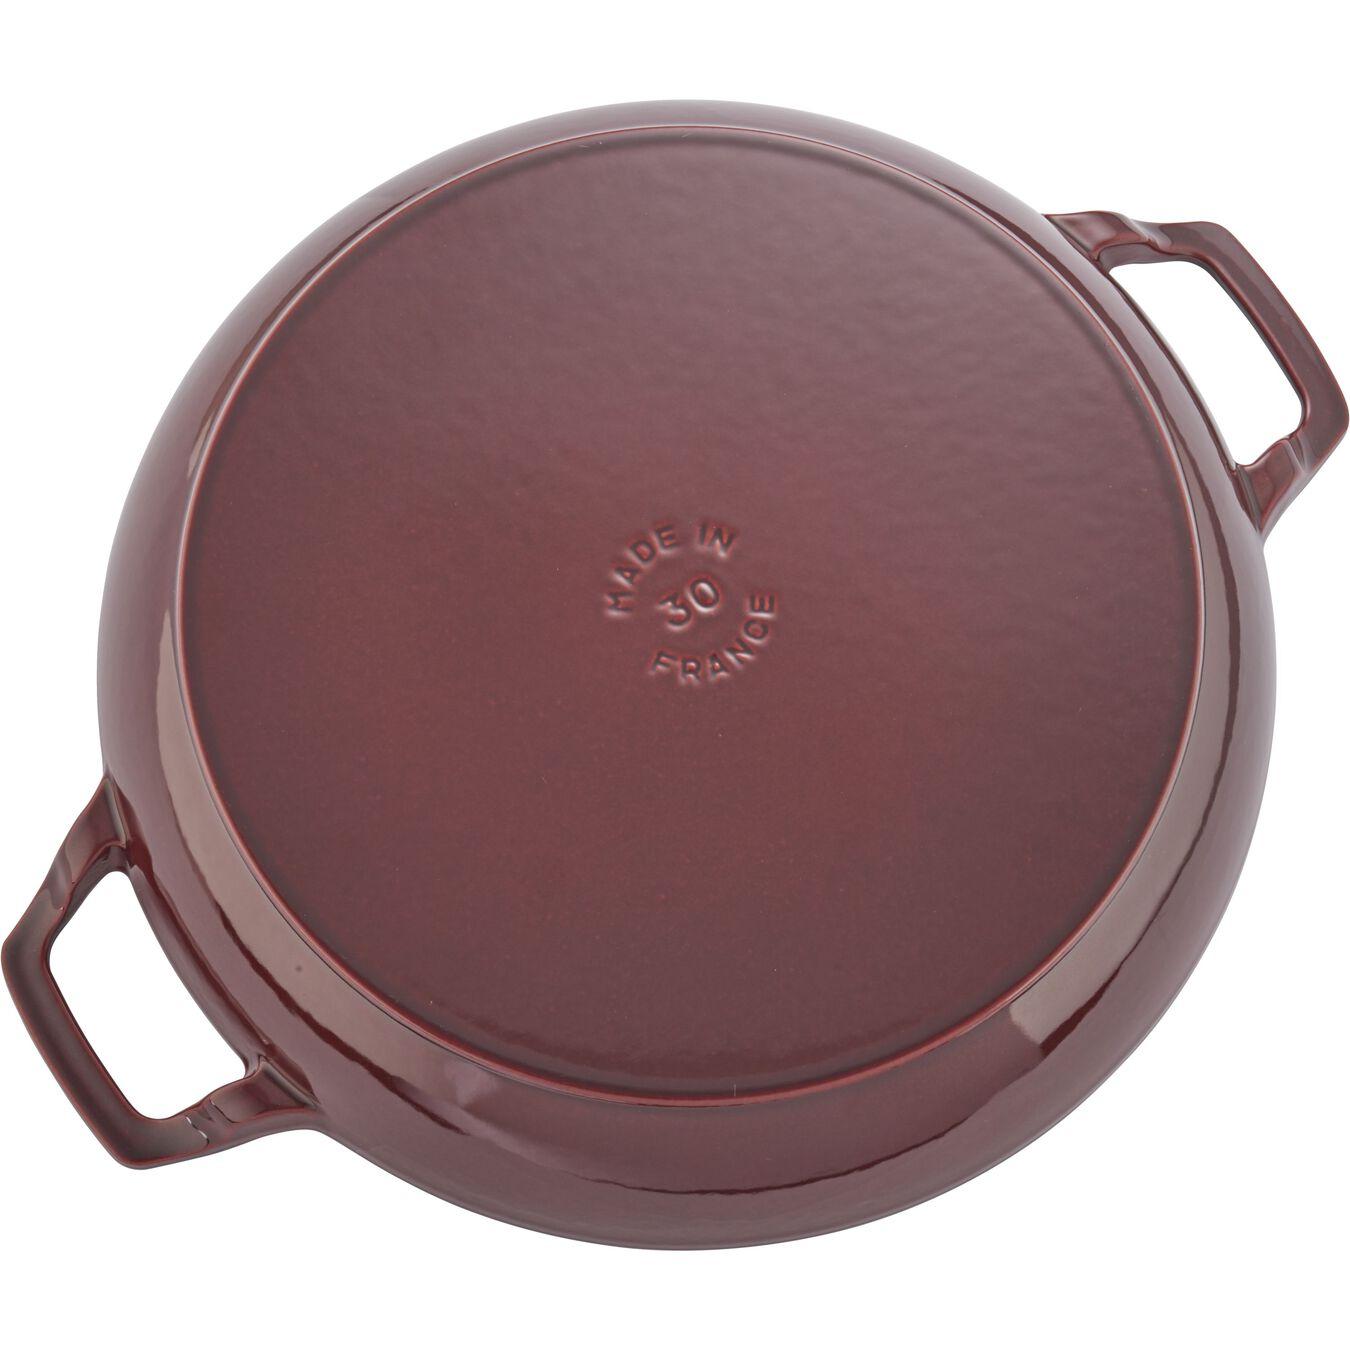 3,5 l Cast iron round Braisière, Grenadine-Red,,large 4